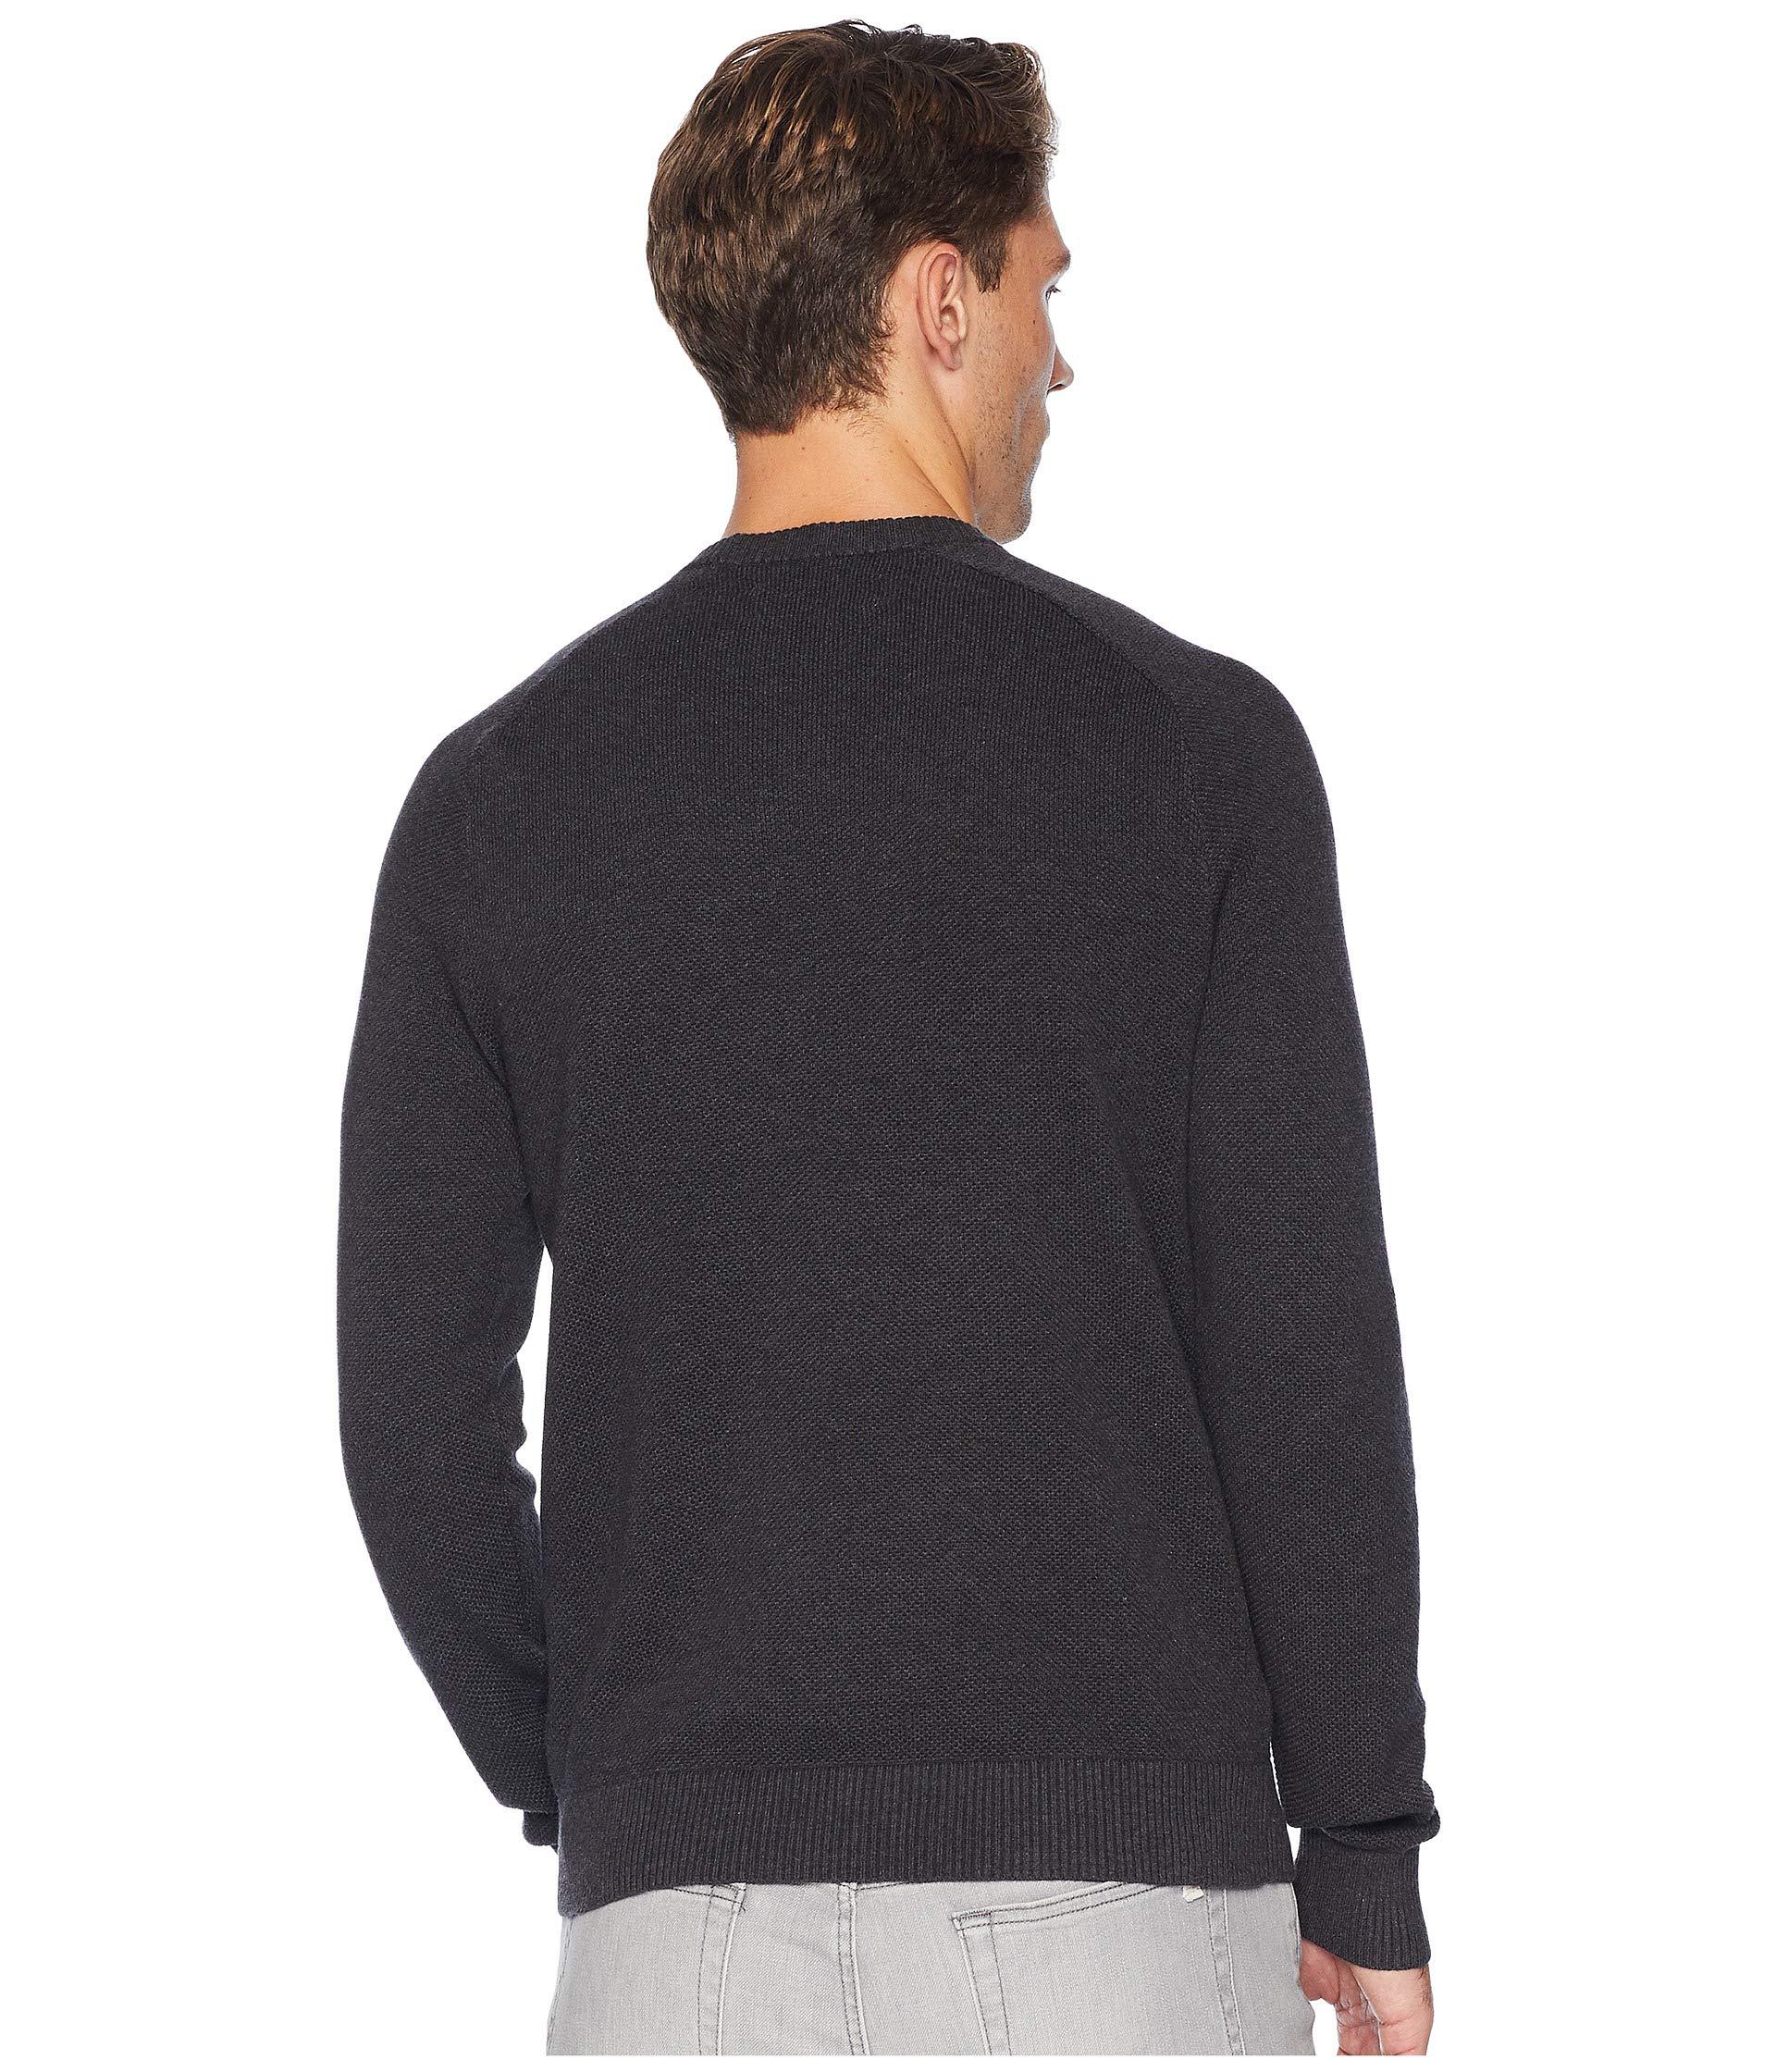 Original Heather Dark Sleeve Penguin Pique Charcoal Honeycomb Long Sweater vxzvwrBq